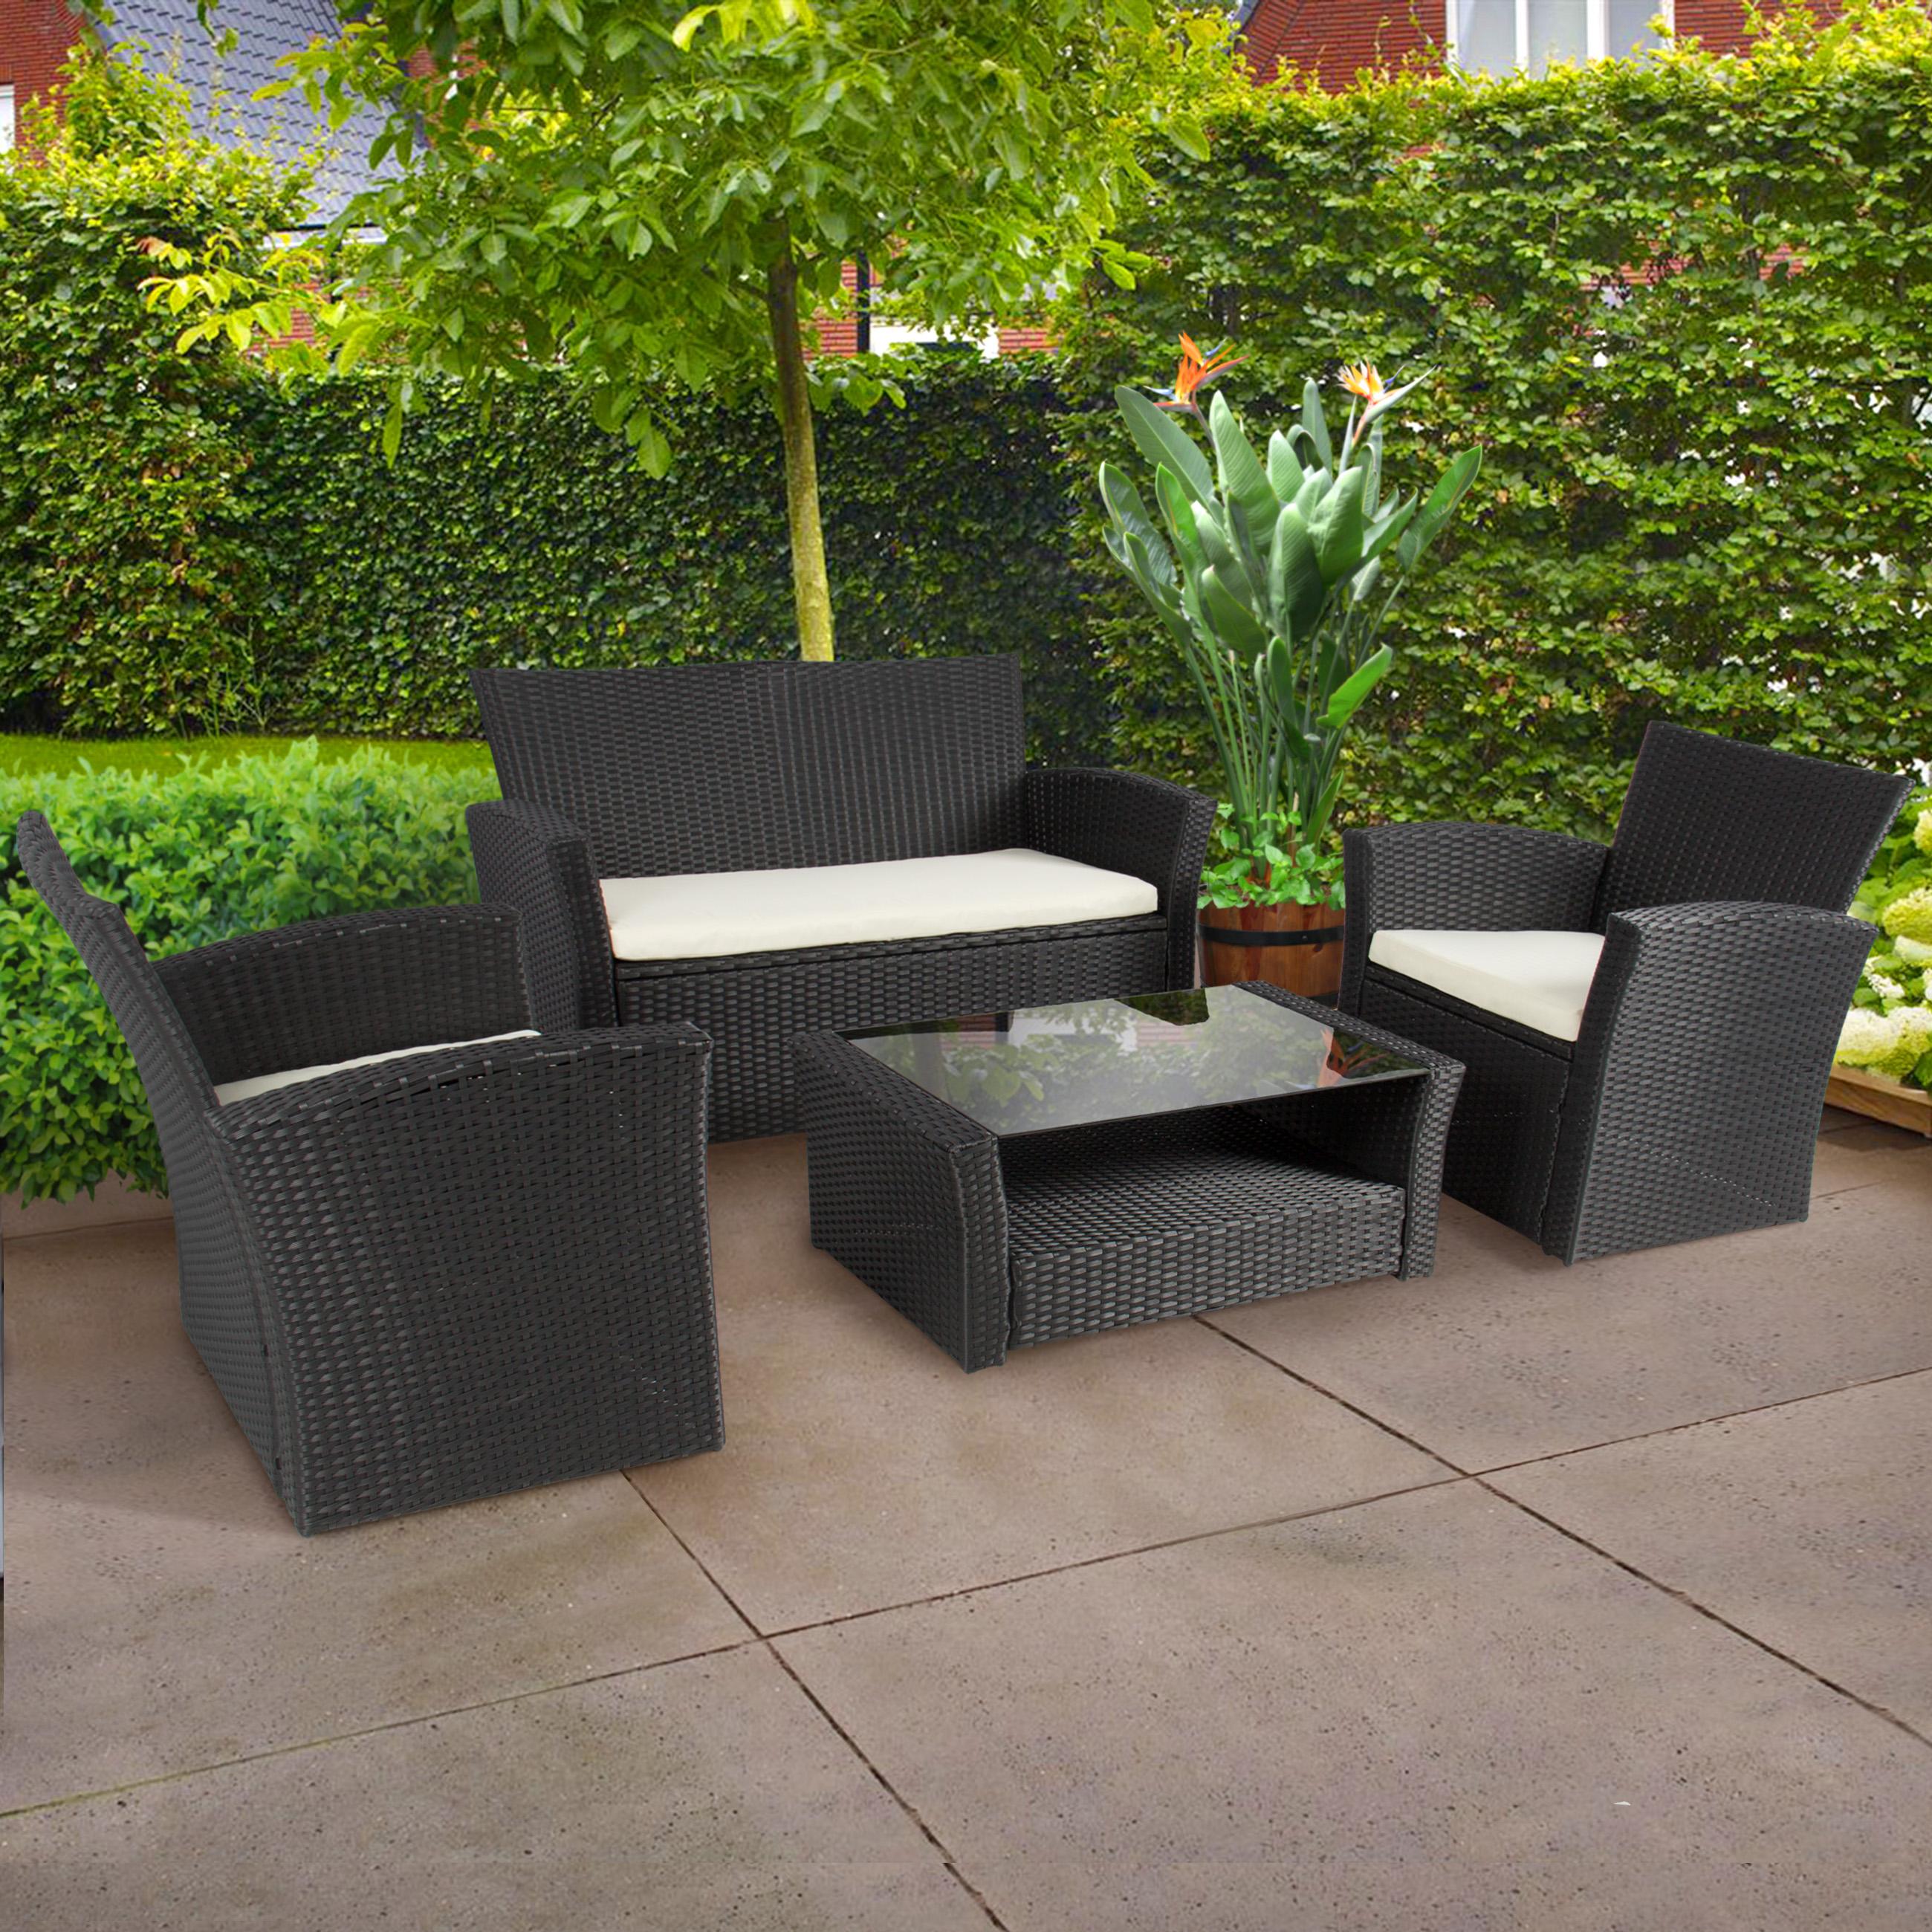 garden set 4pc outdoor patio garden furniture wicker rattan sofa set black ENPPSDA